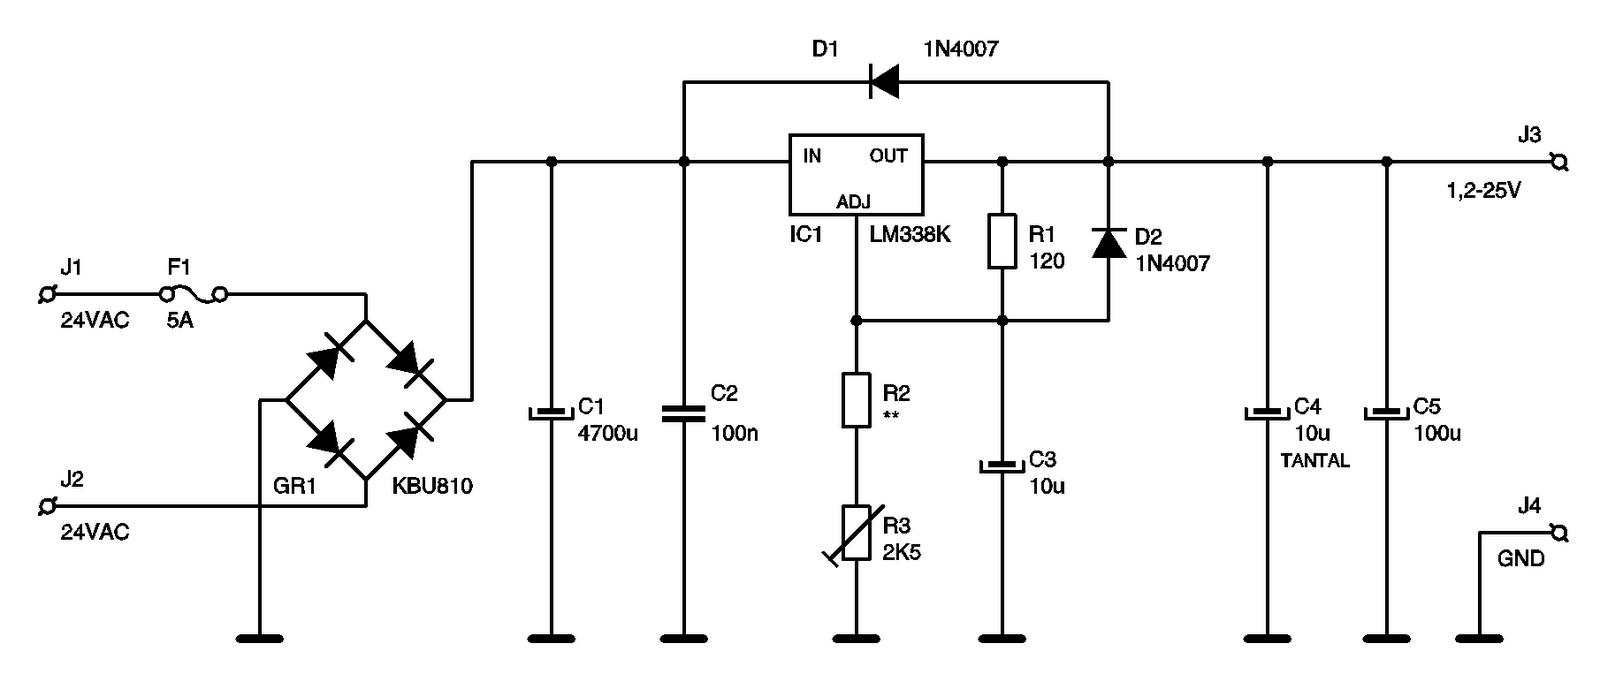 Eletr U00f4nica Free Circuits  Esquema Fonte Vari U00e1vel Com Lm338k Com Diodos De Prote U00e7 U00e3o